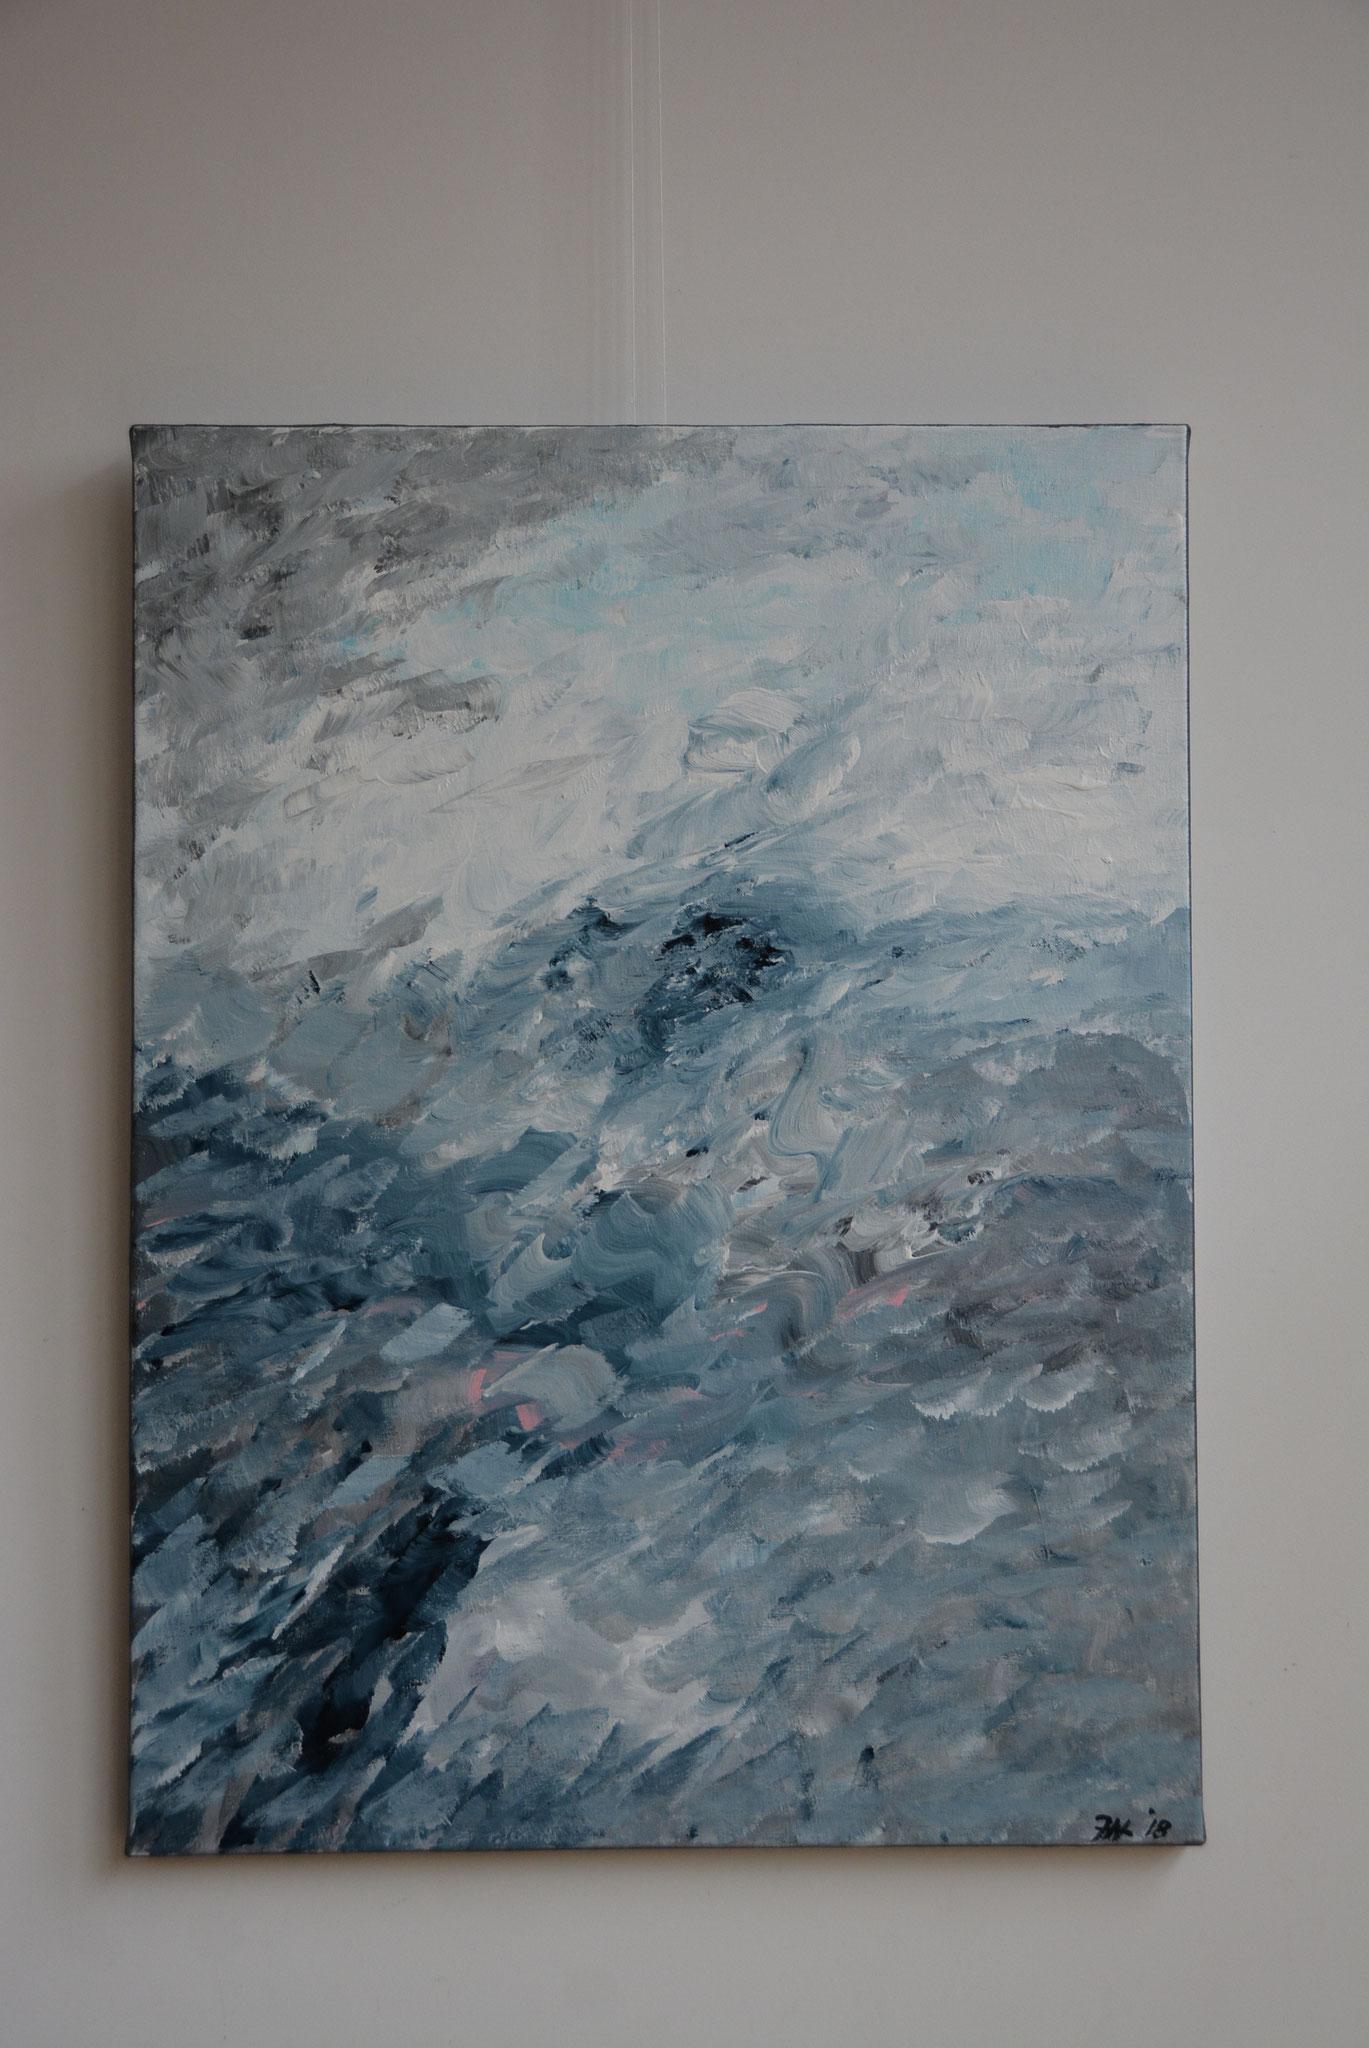 Titel: Tale of the man and the sea, 60 x 80 cm Acryl op Linnen. December 2018. Prijs € 560,-